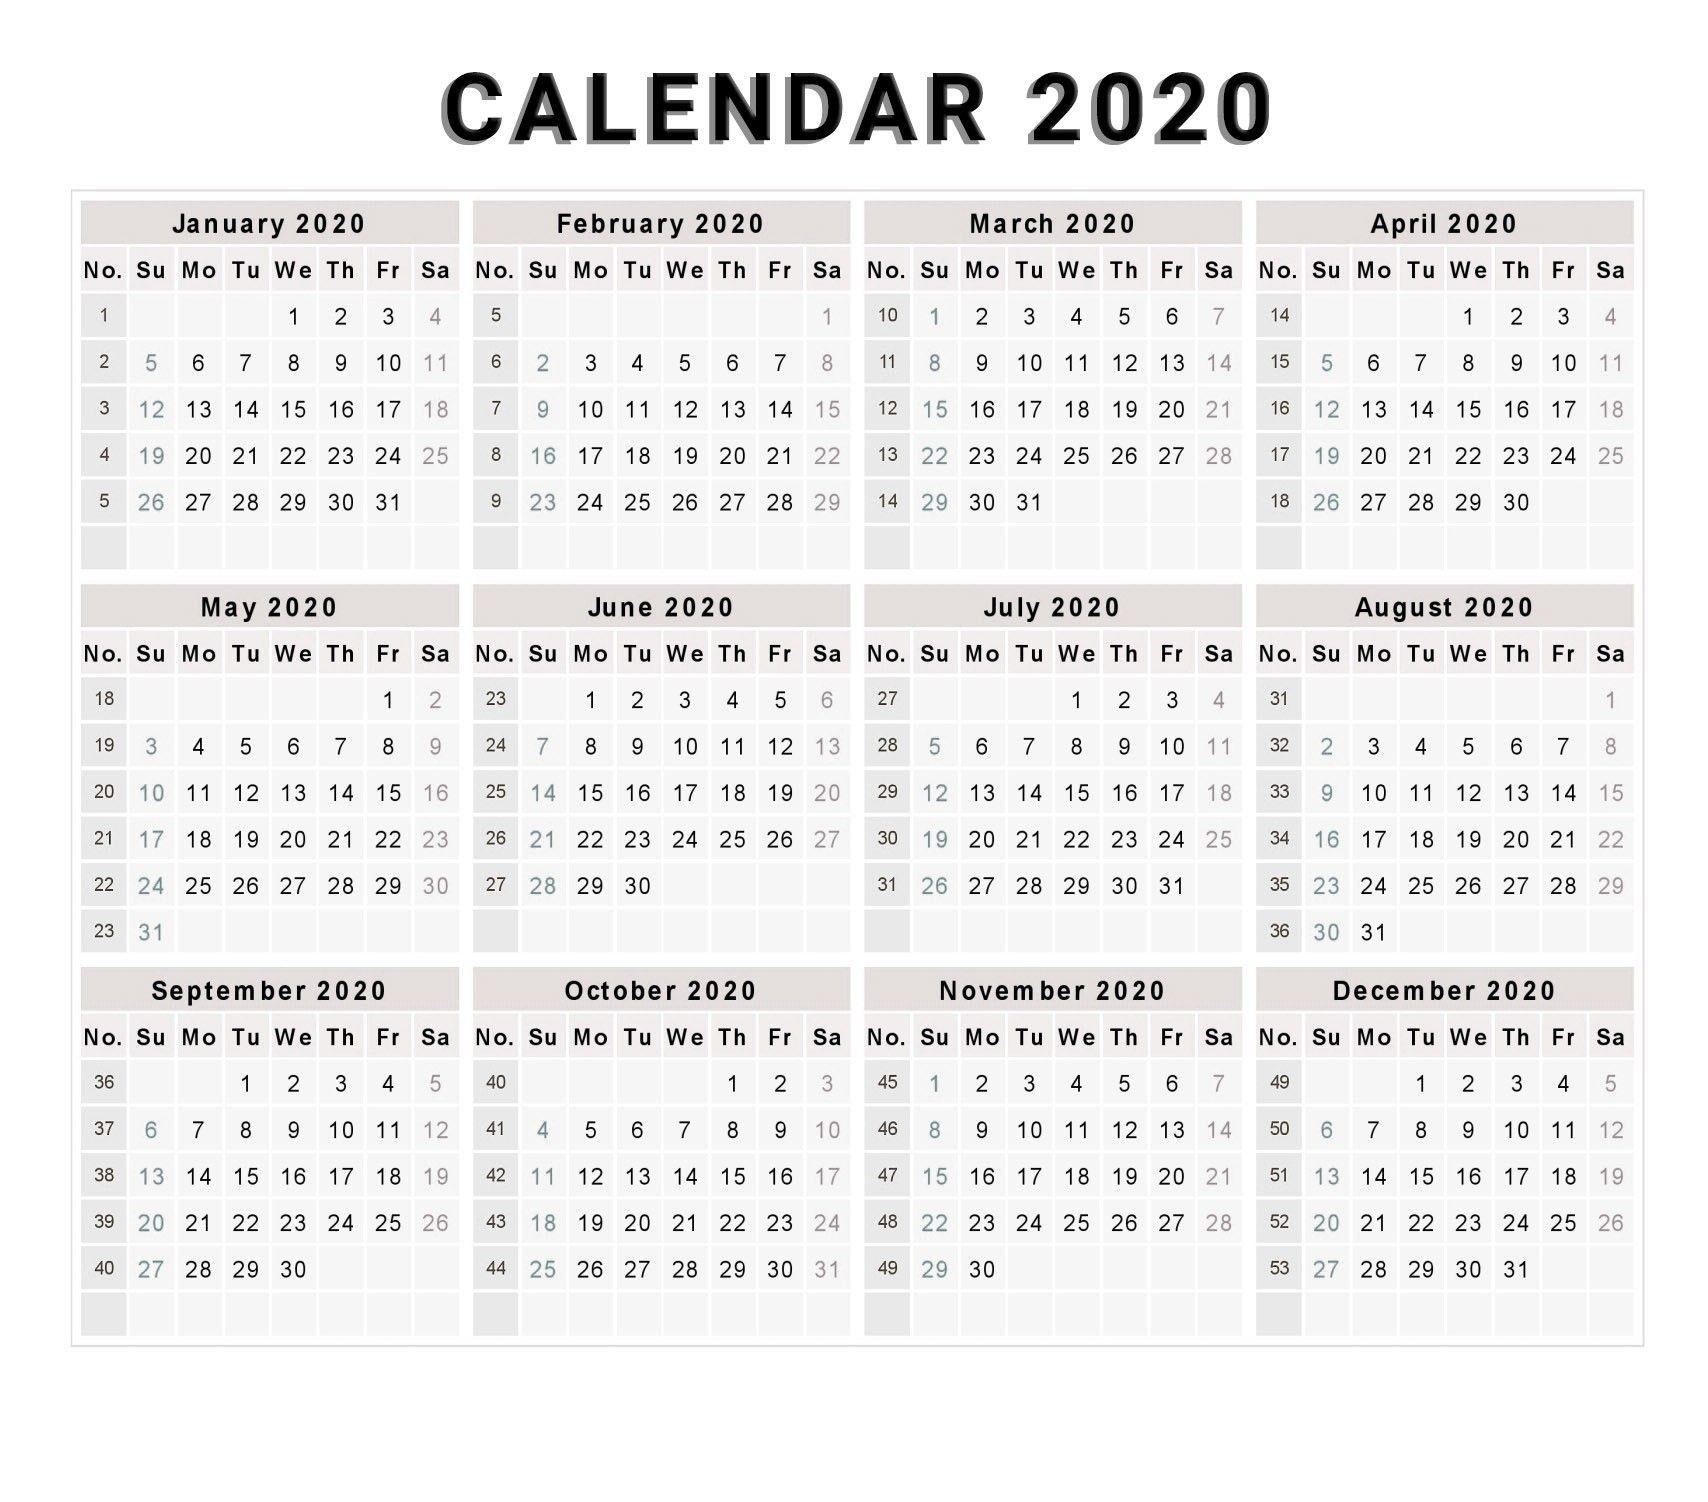 Calendar 2020 Free Printable Calendar 2020 Free 2020 Christmas Calendar 2020 Printable Free